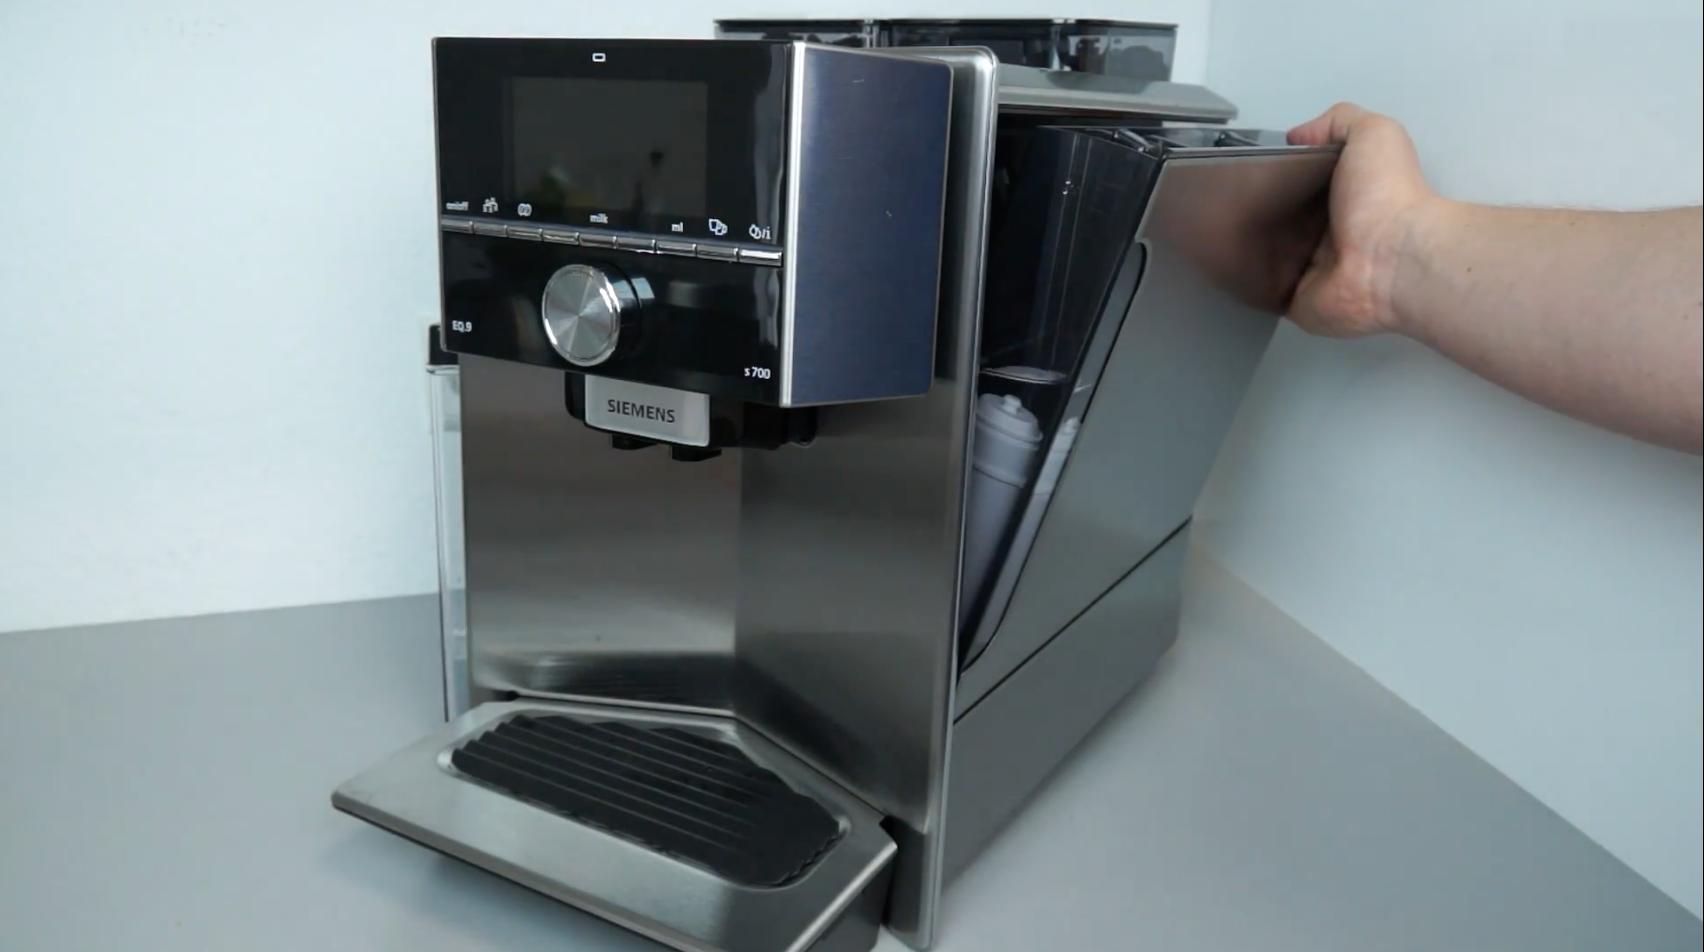 Kaffeevollautomat Siemens Eq 9 S700 Bruheinheit Reinigen Franks Blog